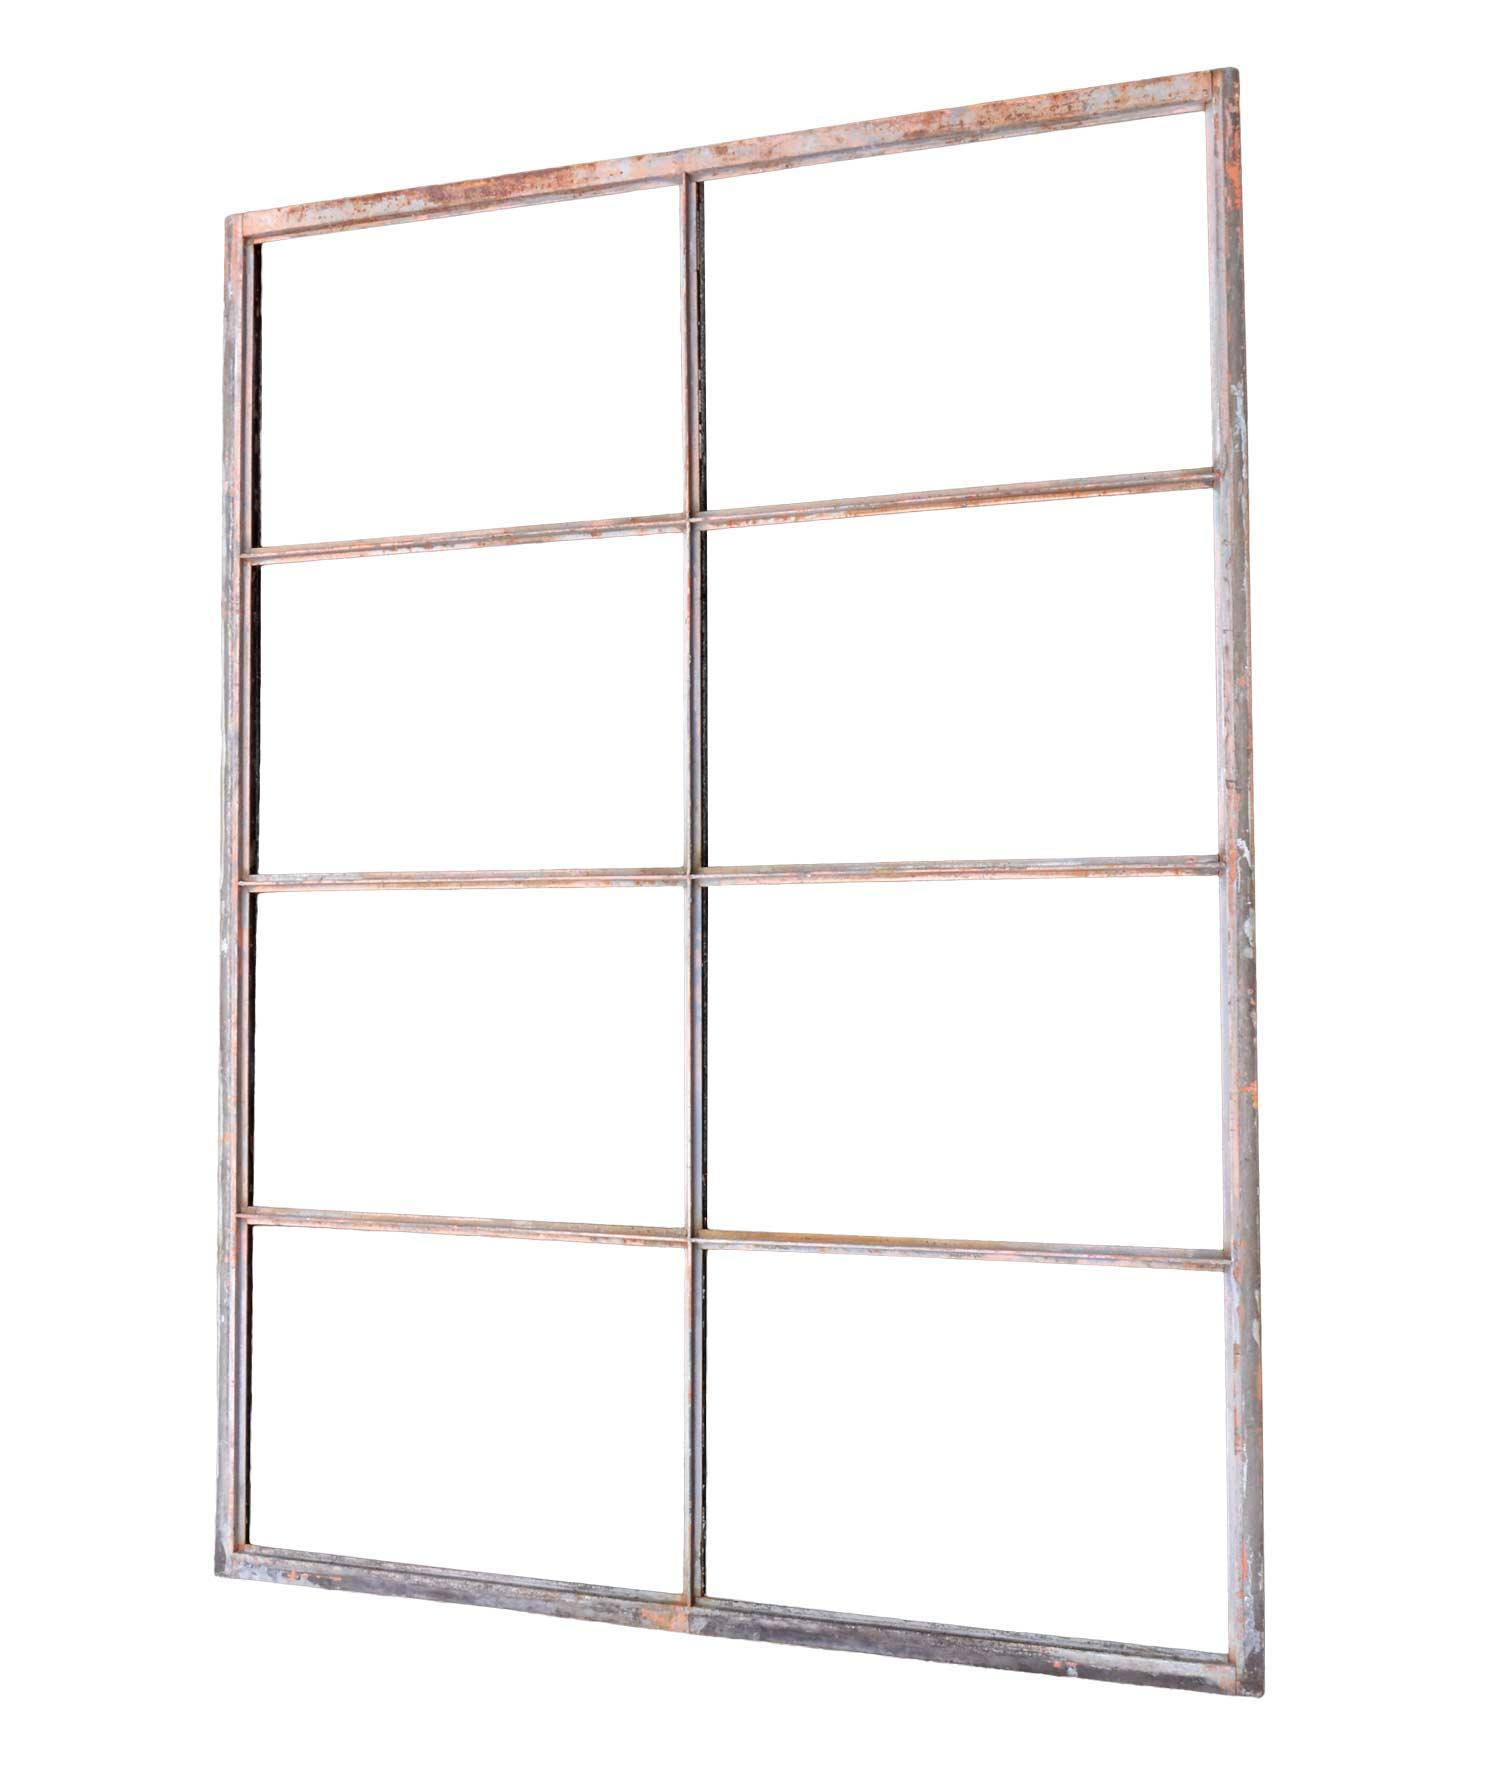 46240-small-iron-warehouse-window.jpg